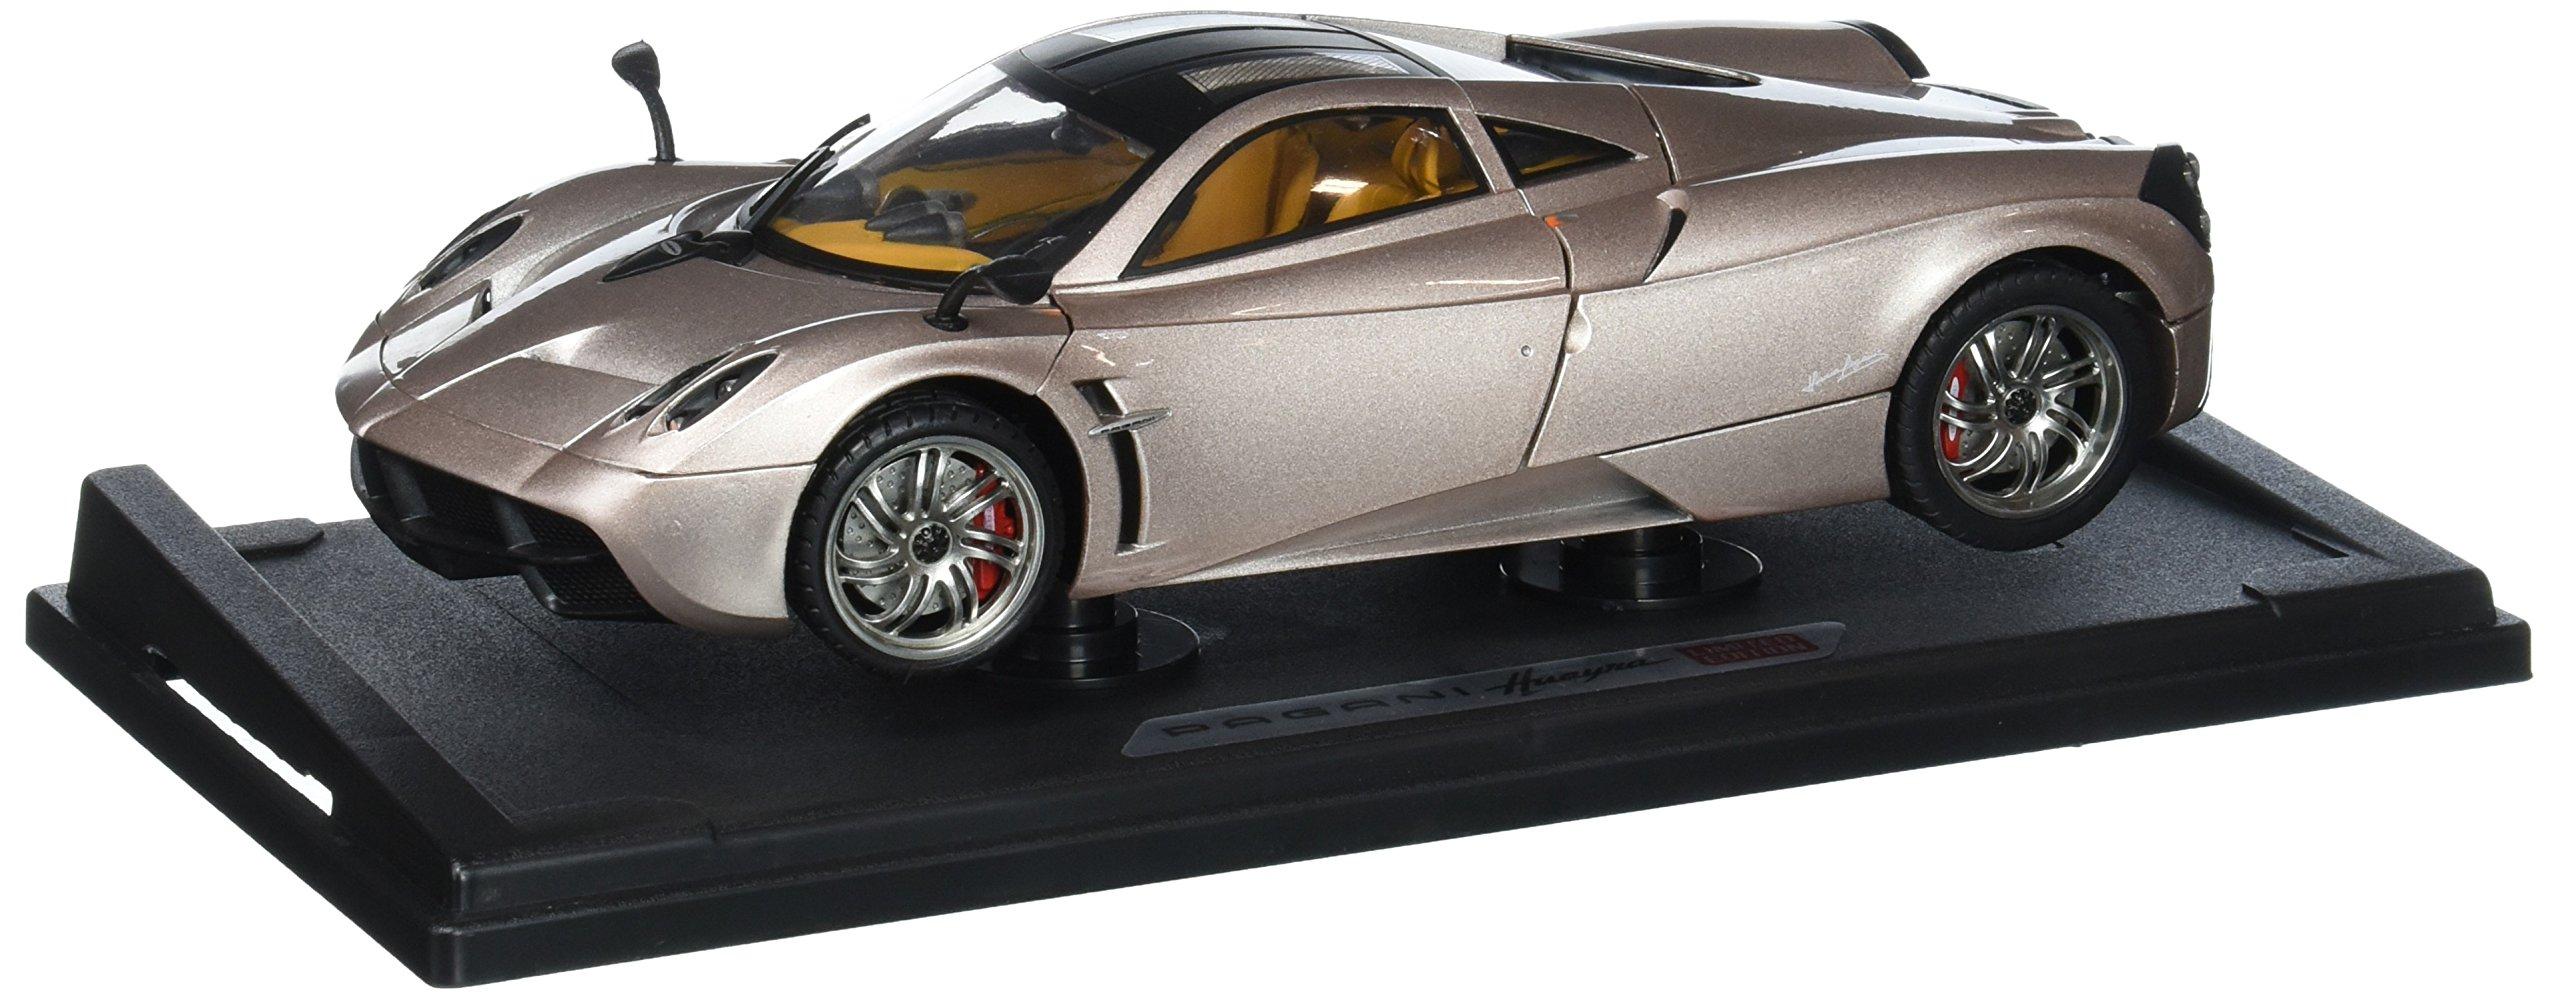 Motor Max 1:18 Platinum Collection Pagane Huayra Diecast Vehicles